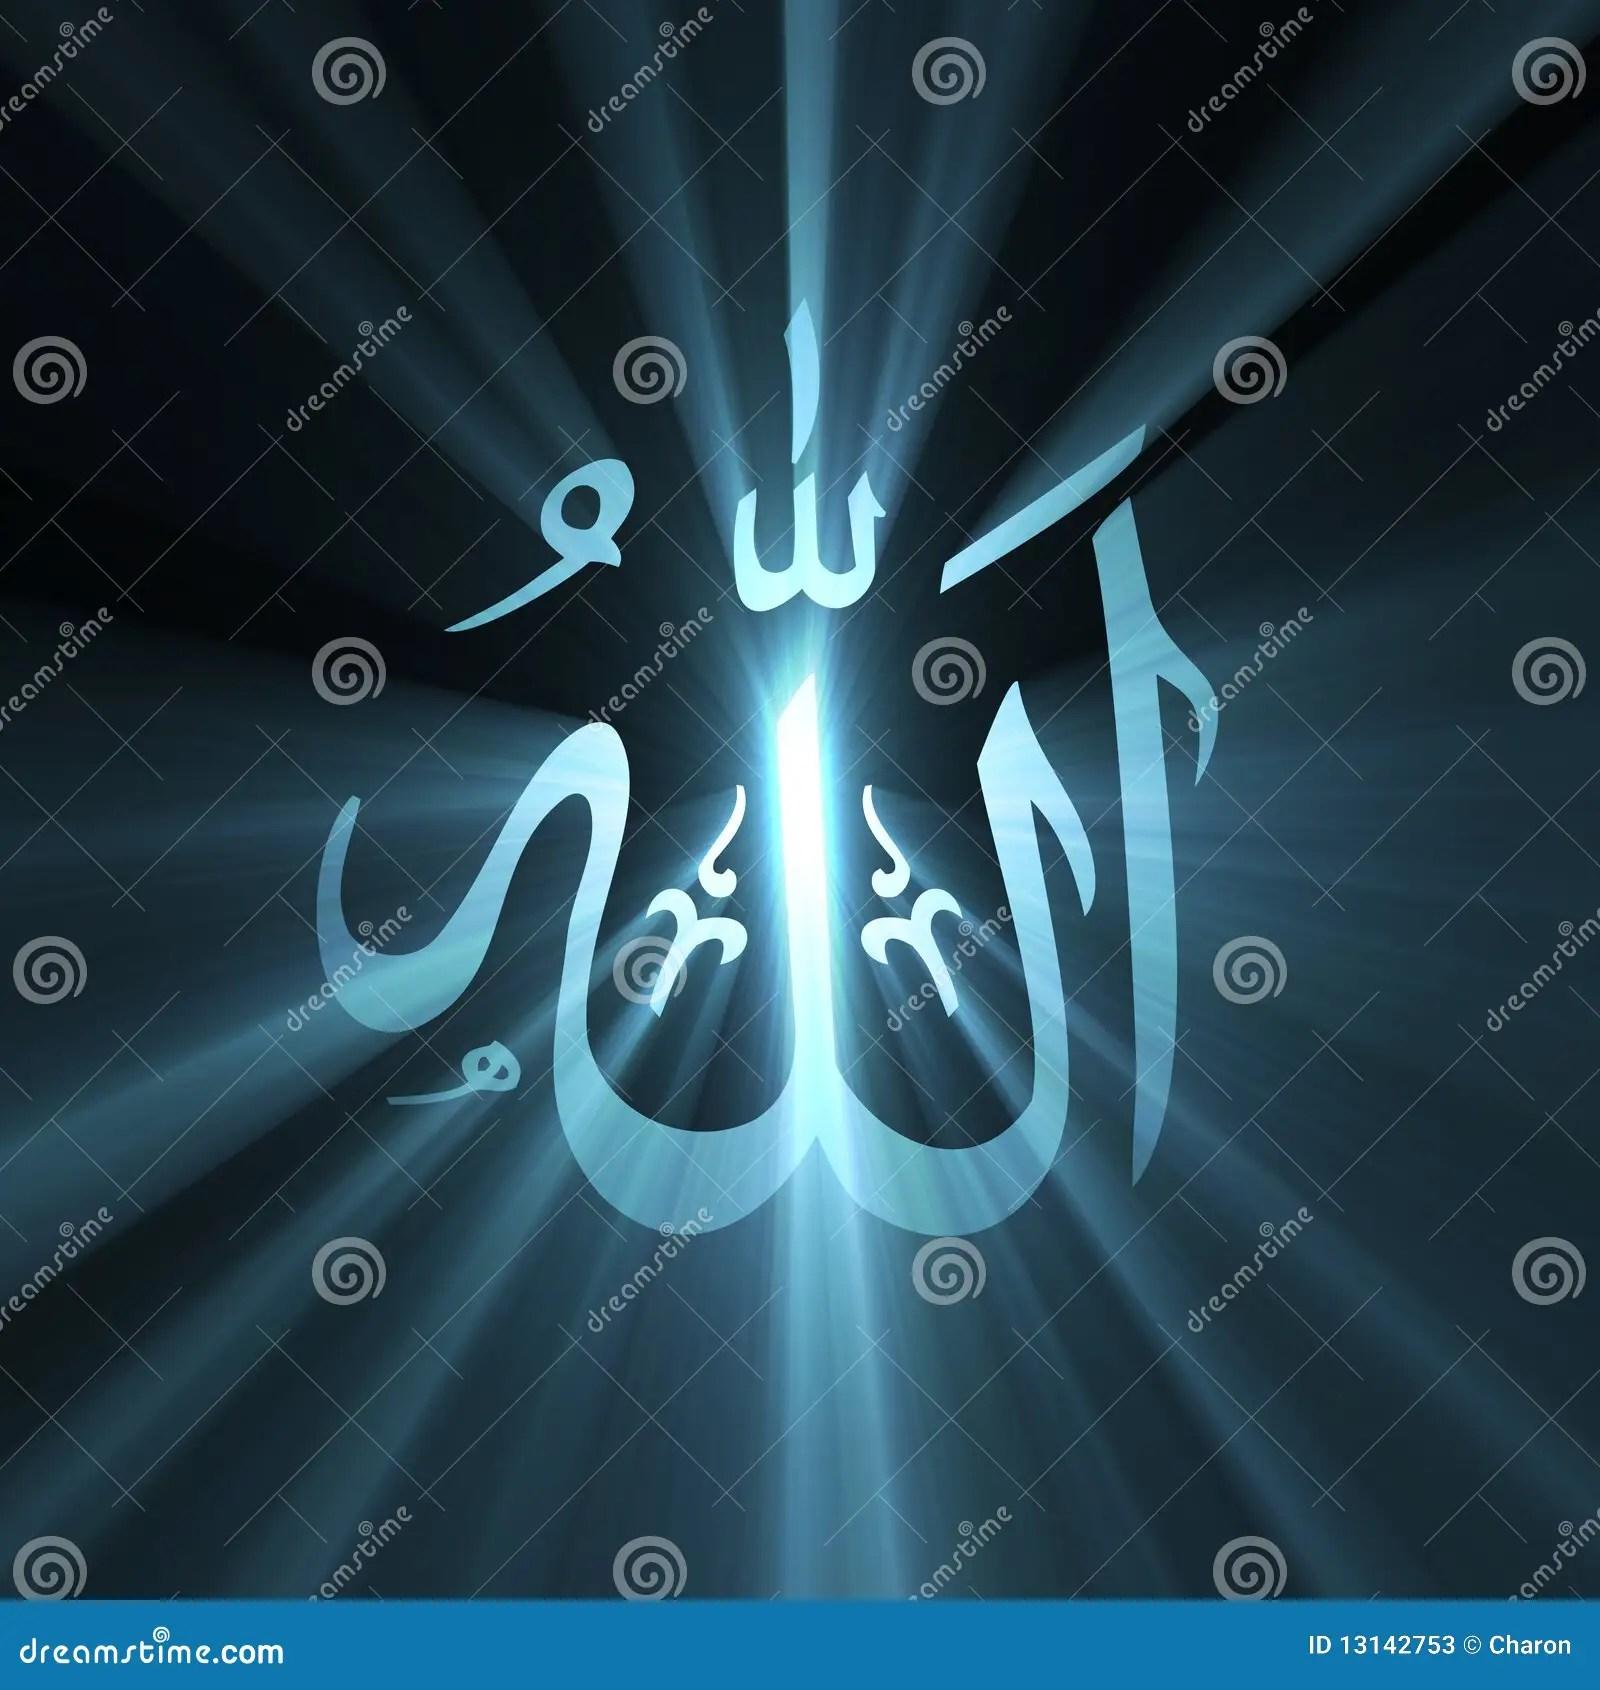 Blue Wallpaper Hd Download Allah Arabic Symbol Light Flare Stock Photos Image 13142753